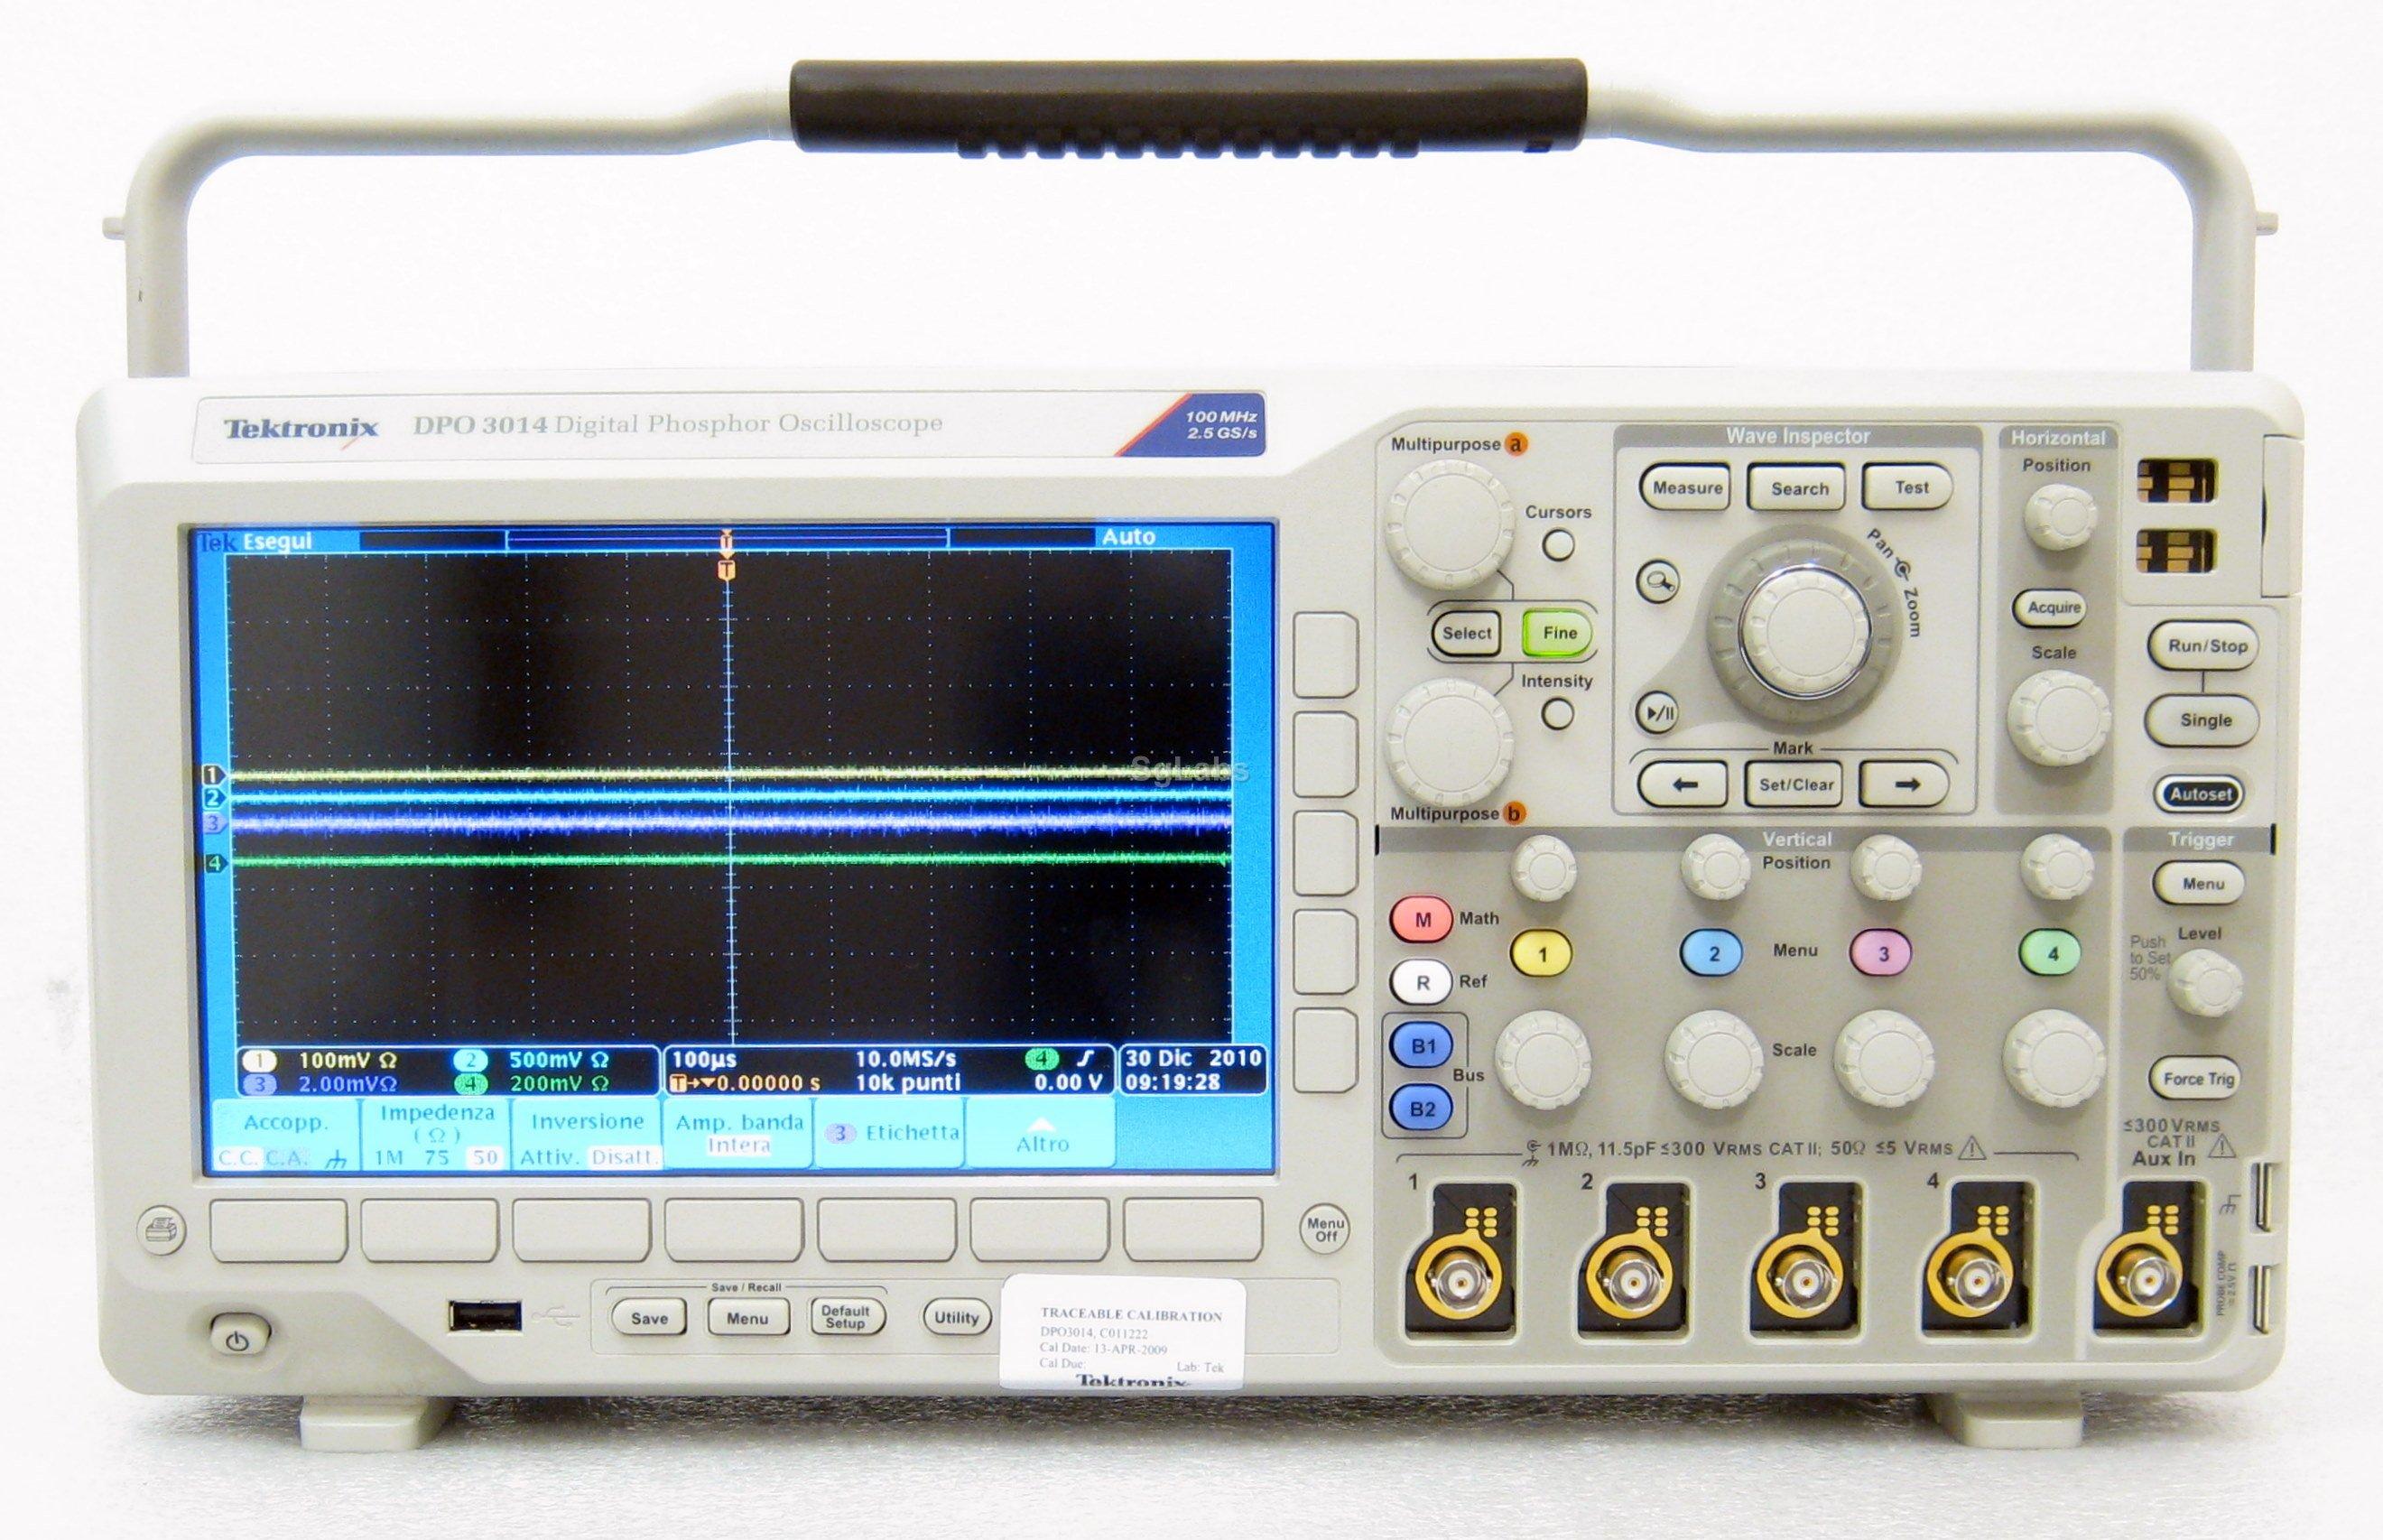 Tektronix dpo3014